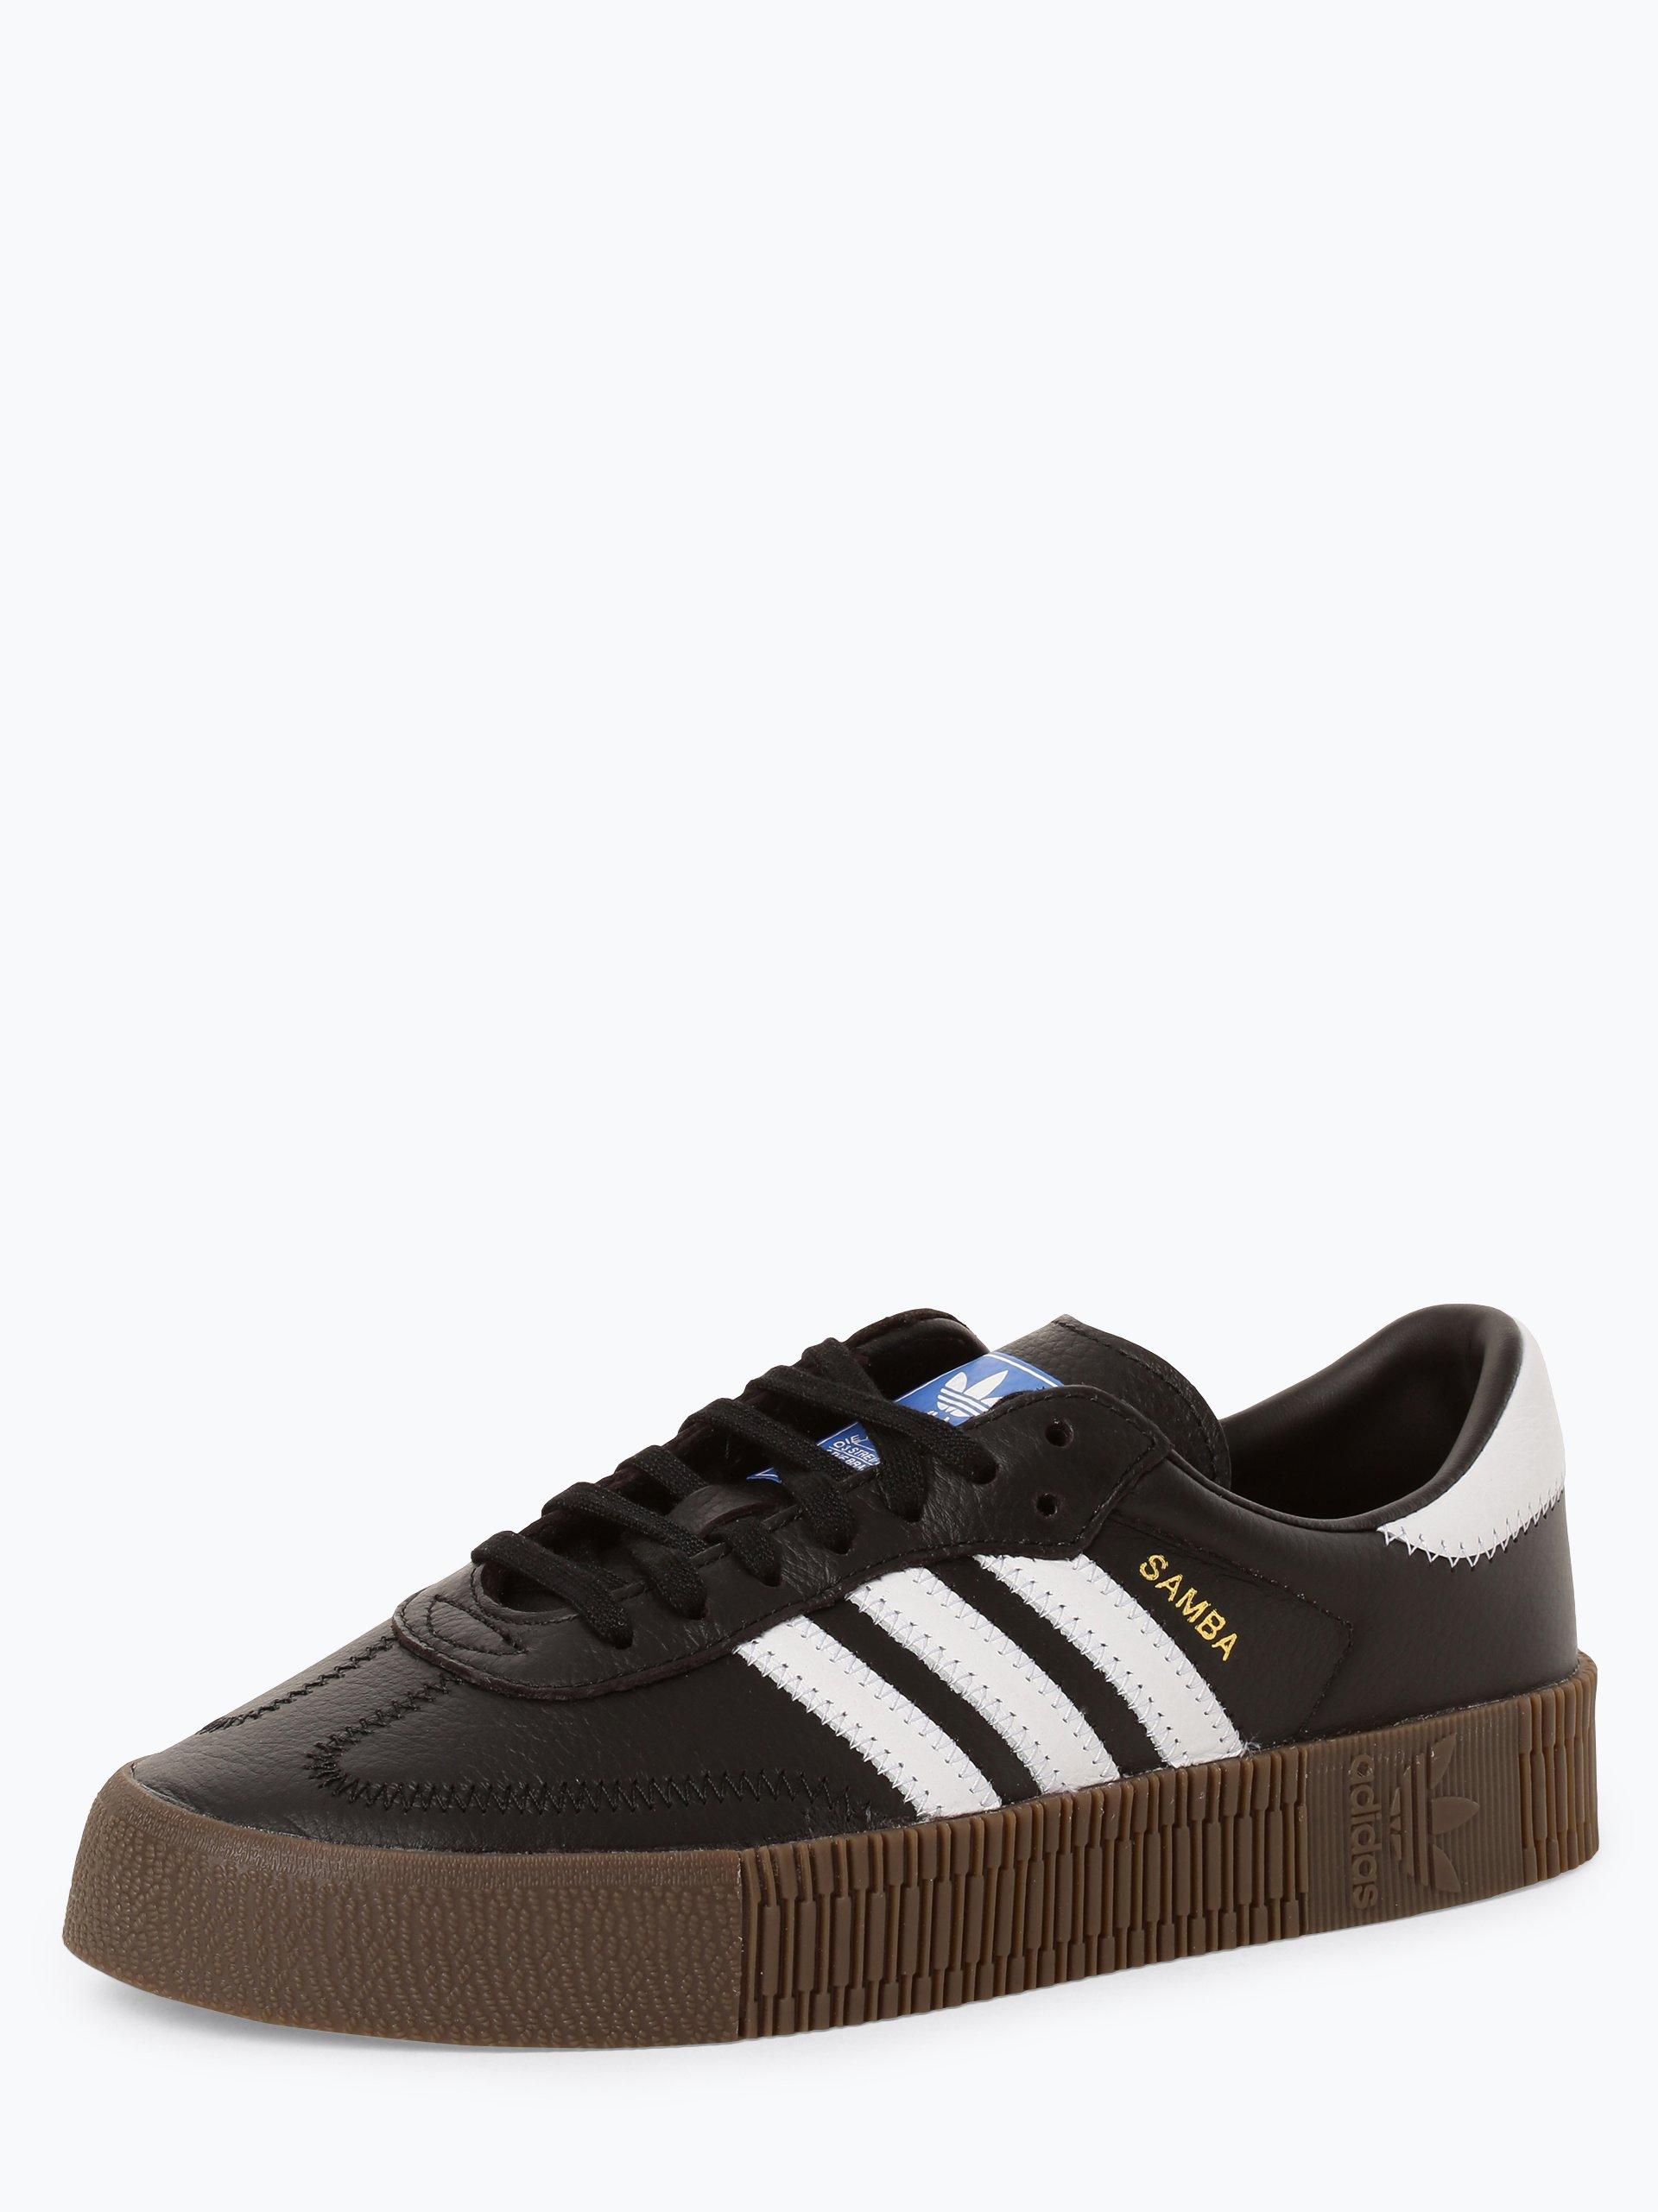 adidas Originals Damen Sneaker aus Leder - Sambarose